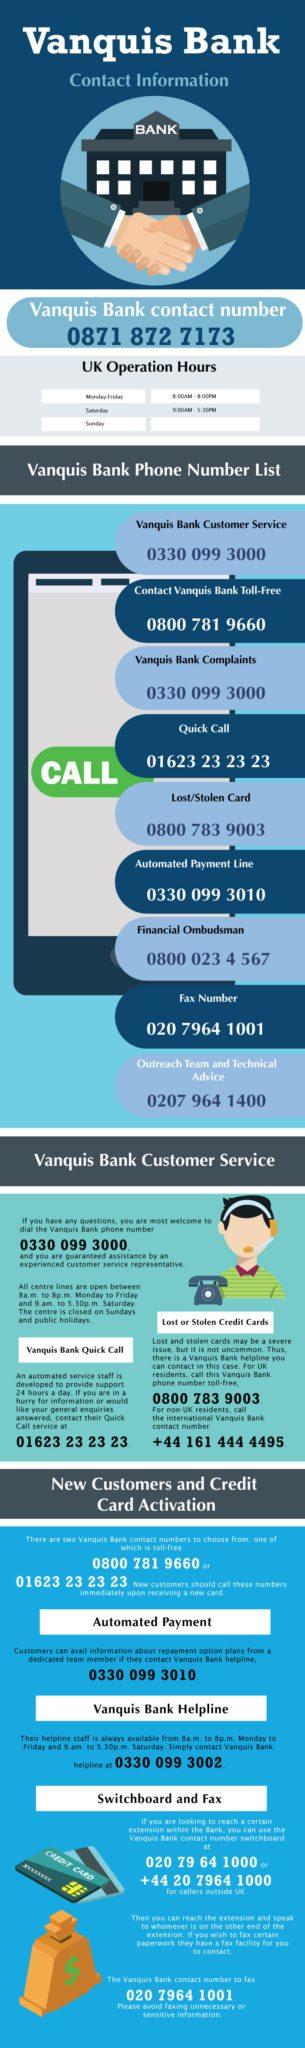 Vanquis Bank Customer Service Contact Number